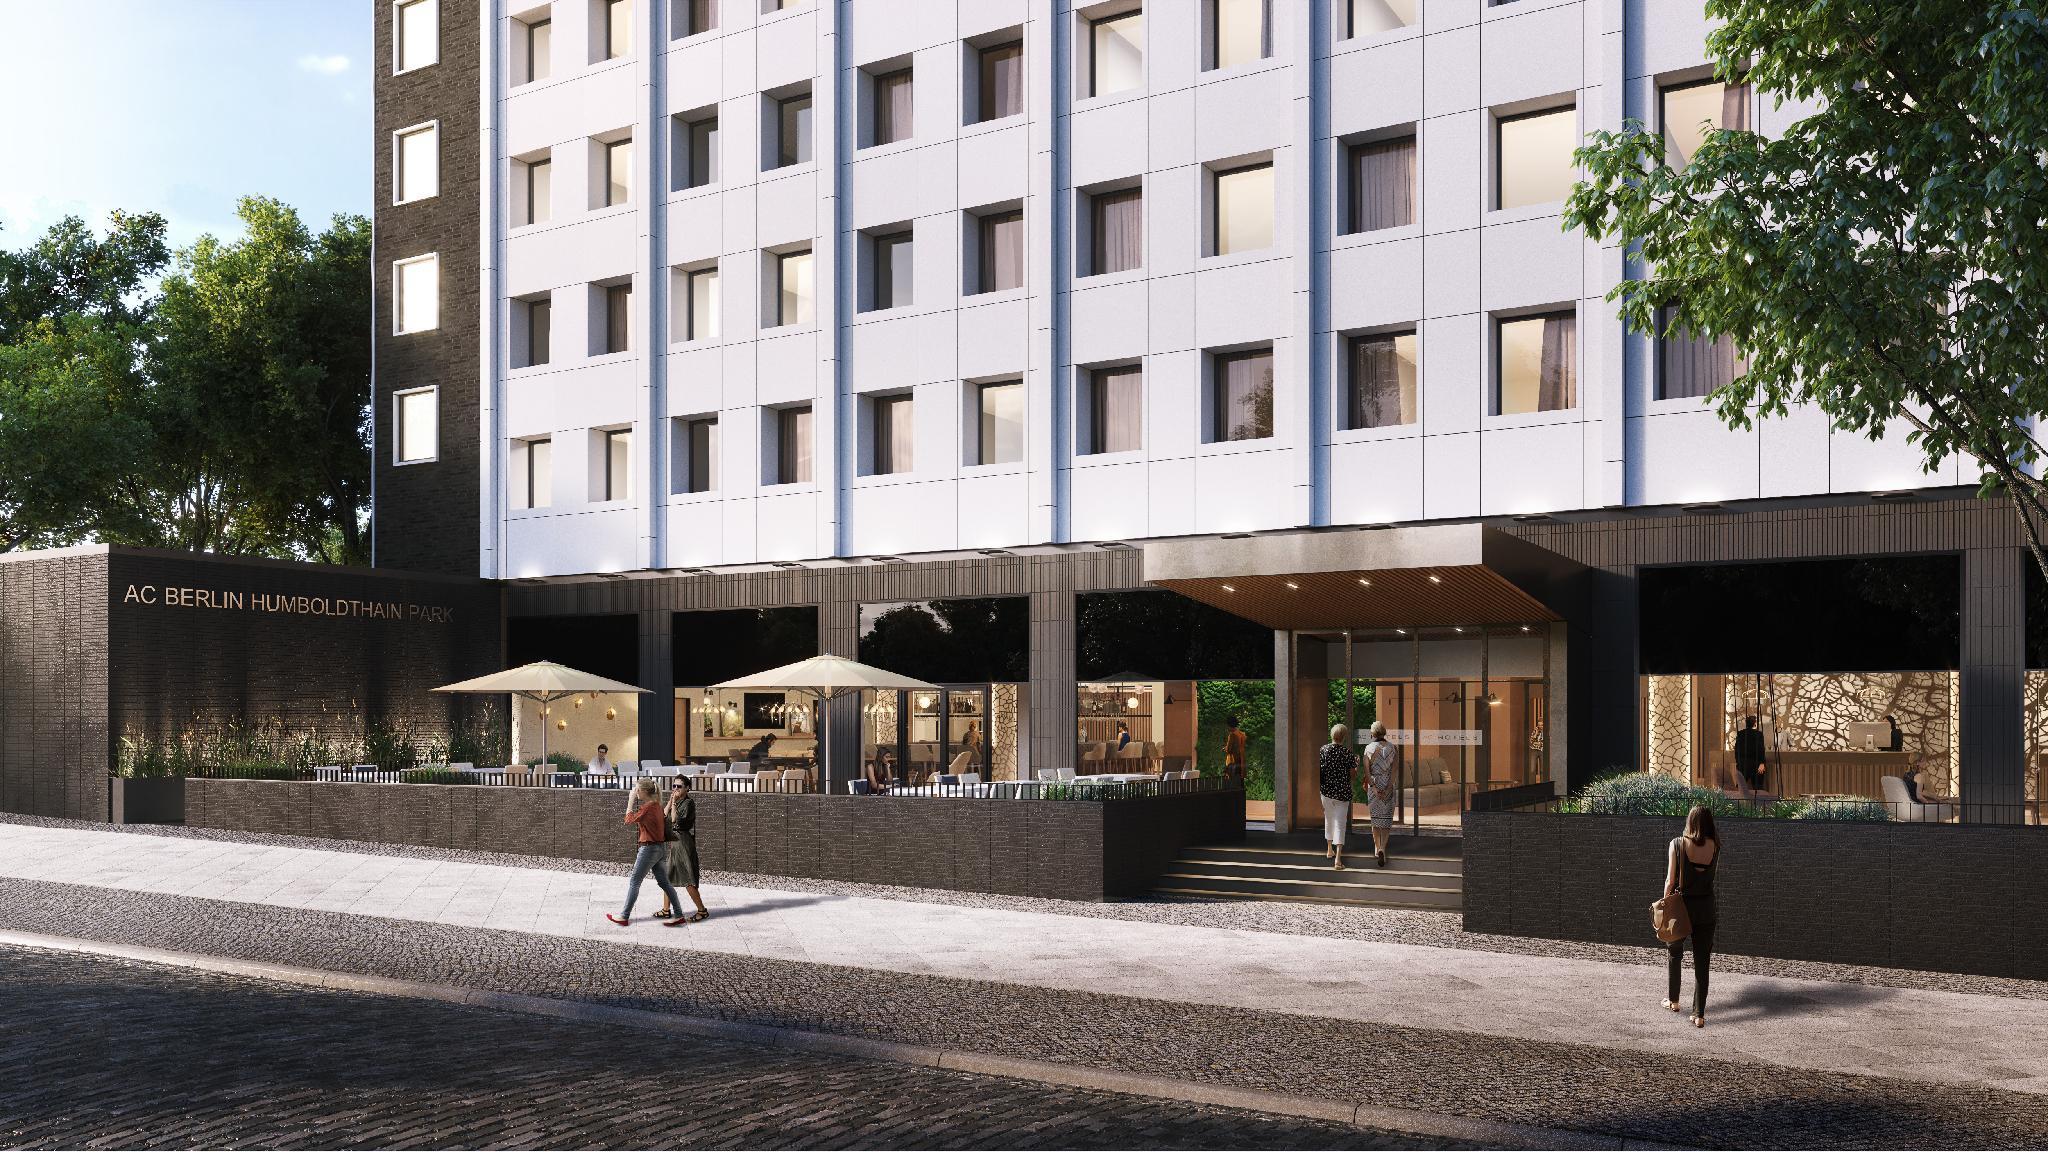 AC Hotel Berlin Humboldthain Park